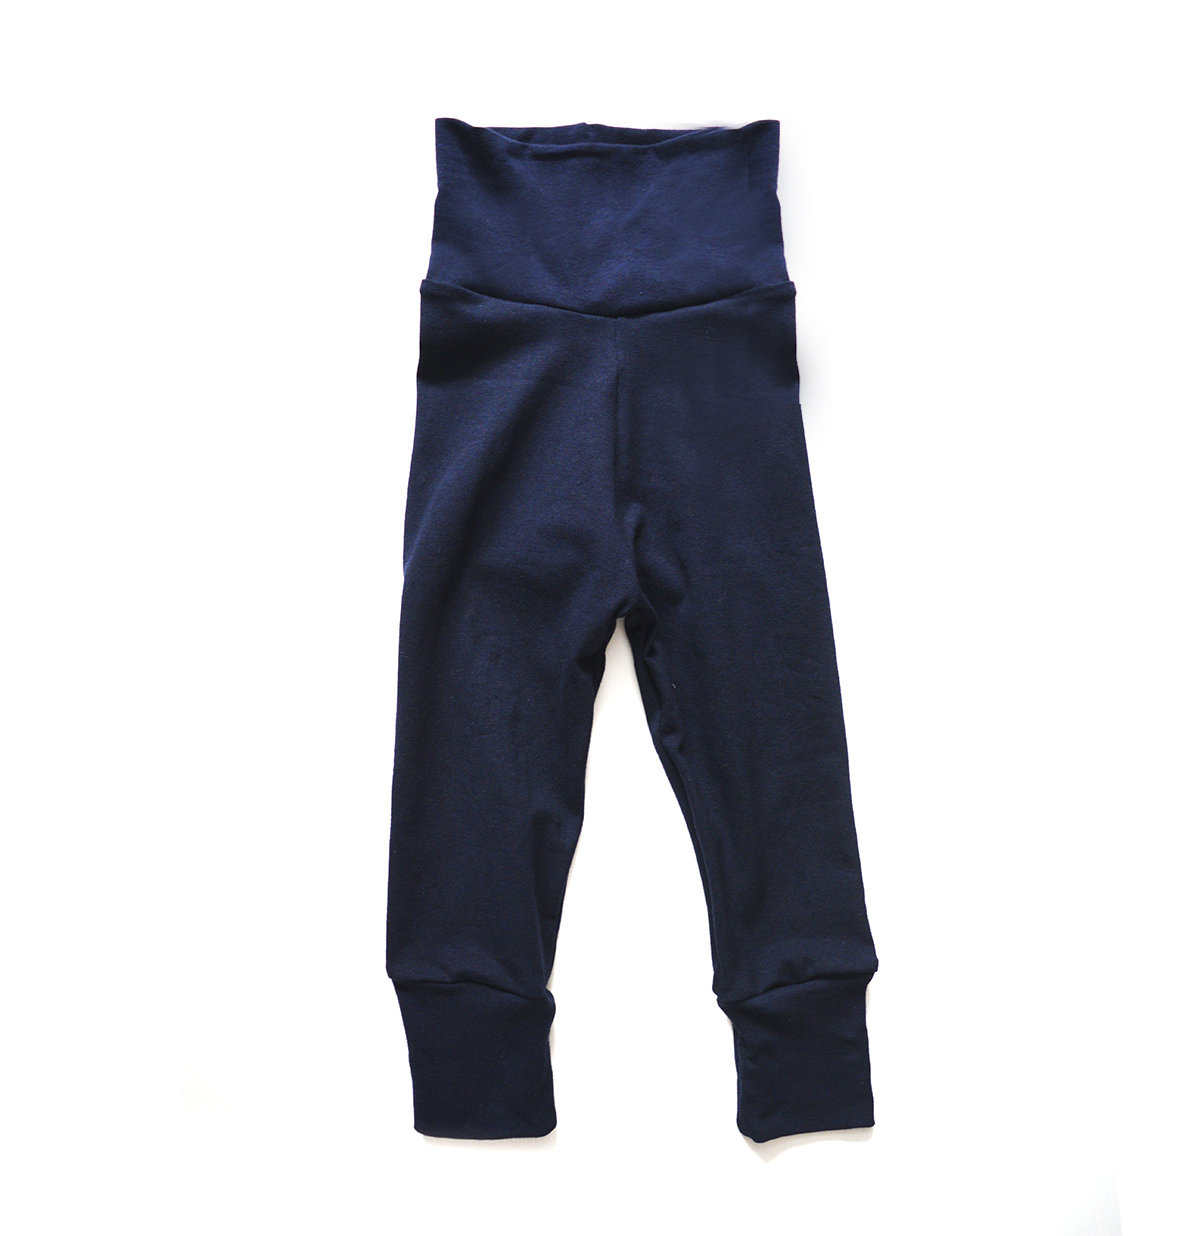 Little Sprout Pants™ Navy - Regular Fit 00486